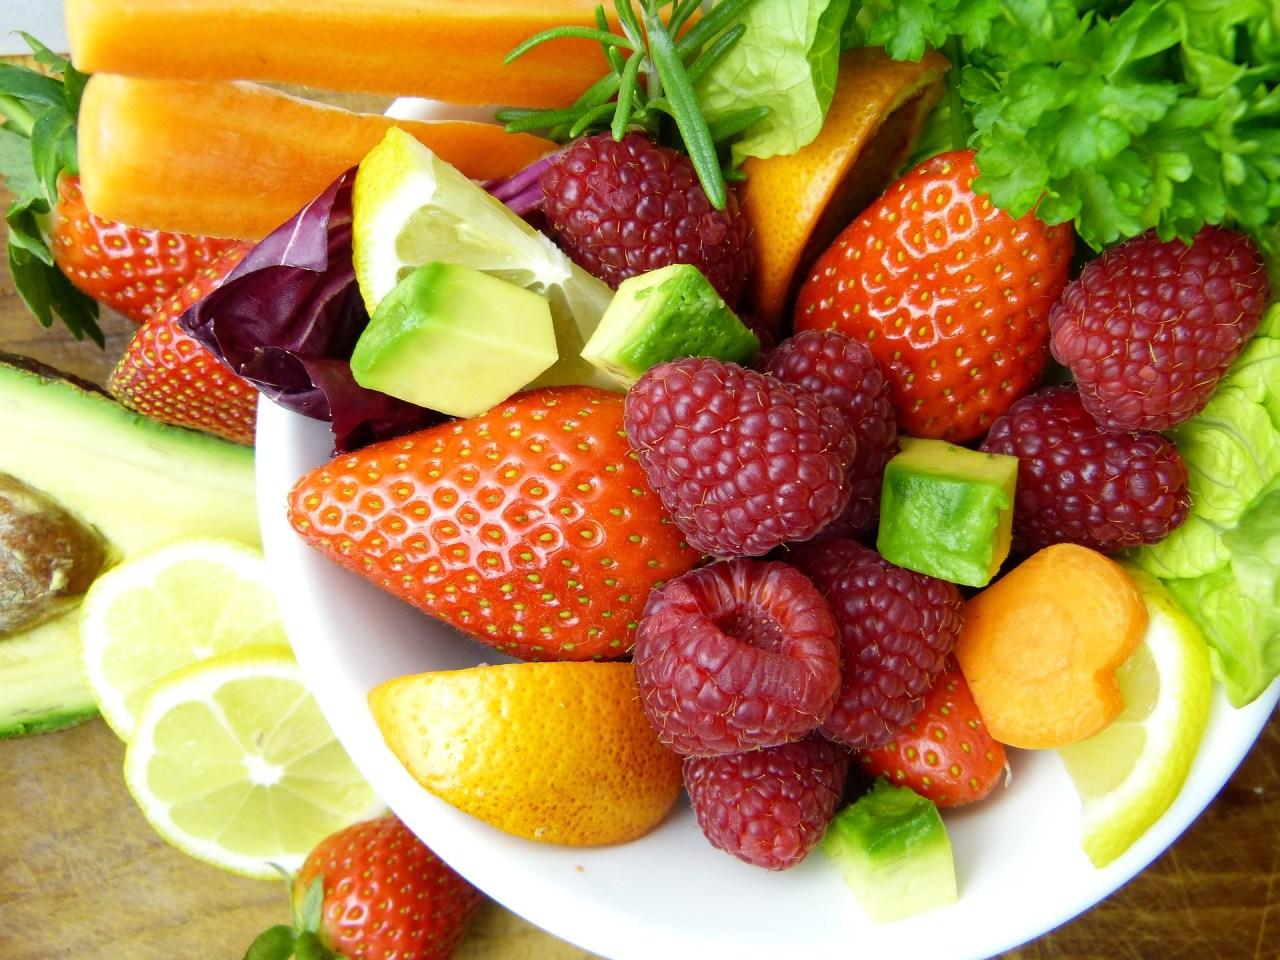 10 Reasons to Eat Seasonal Fruits and Vegetables